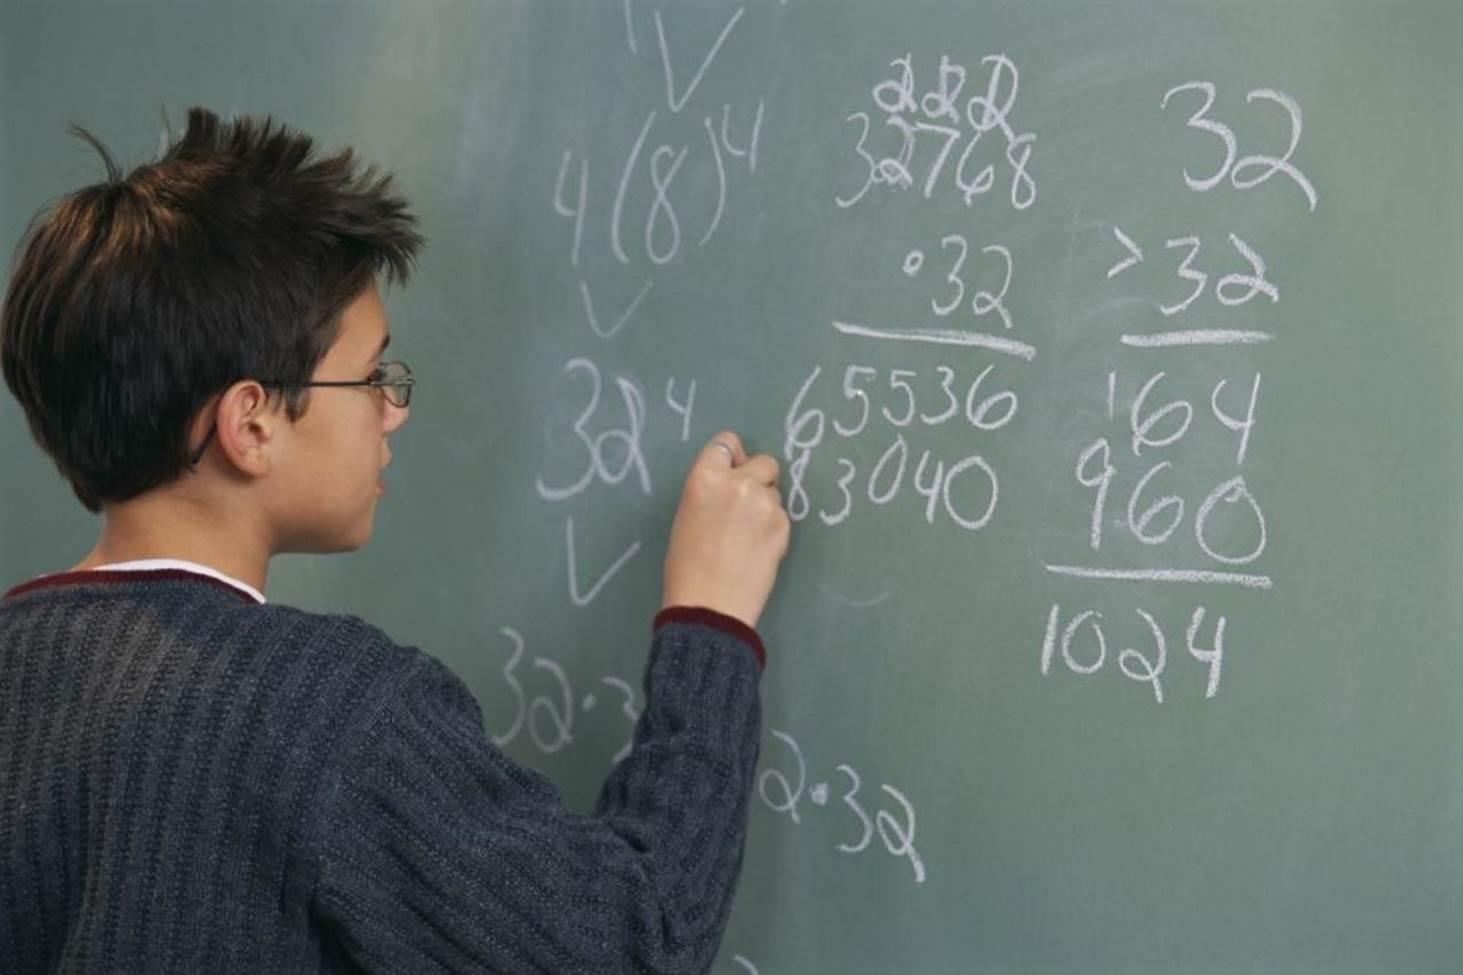 fipi-nazval-glavnye-oshibki-uchastnikov-ege-po-matematike